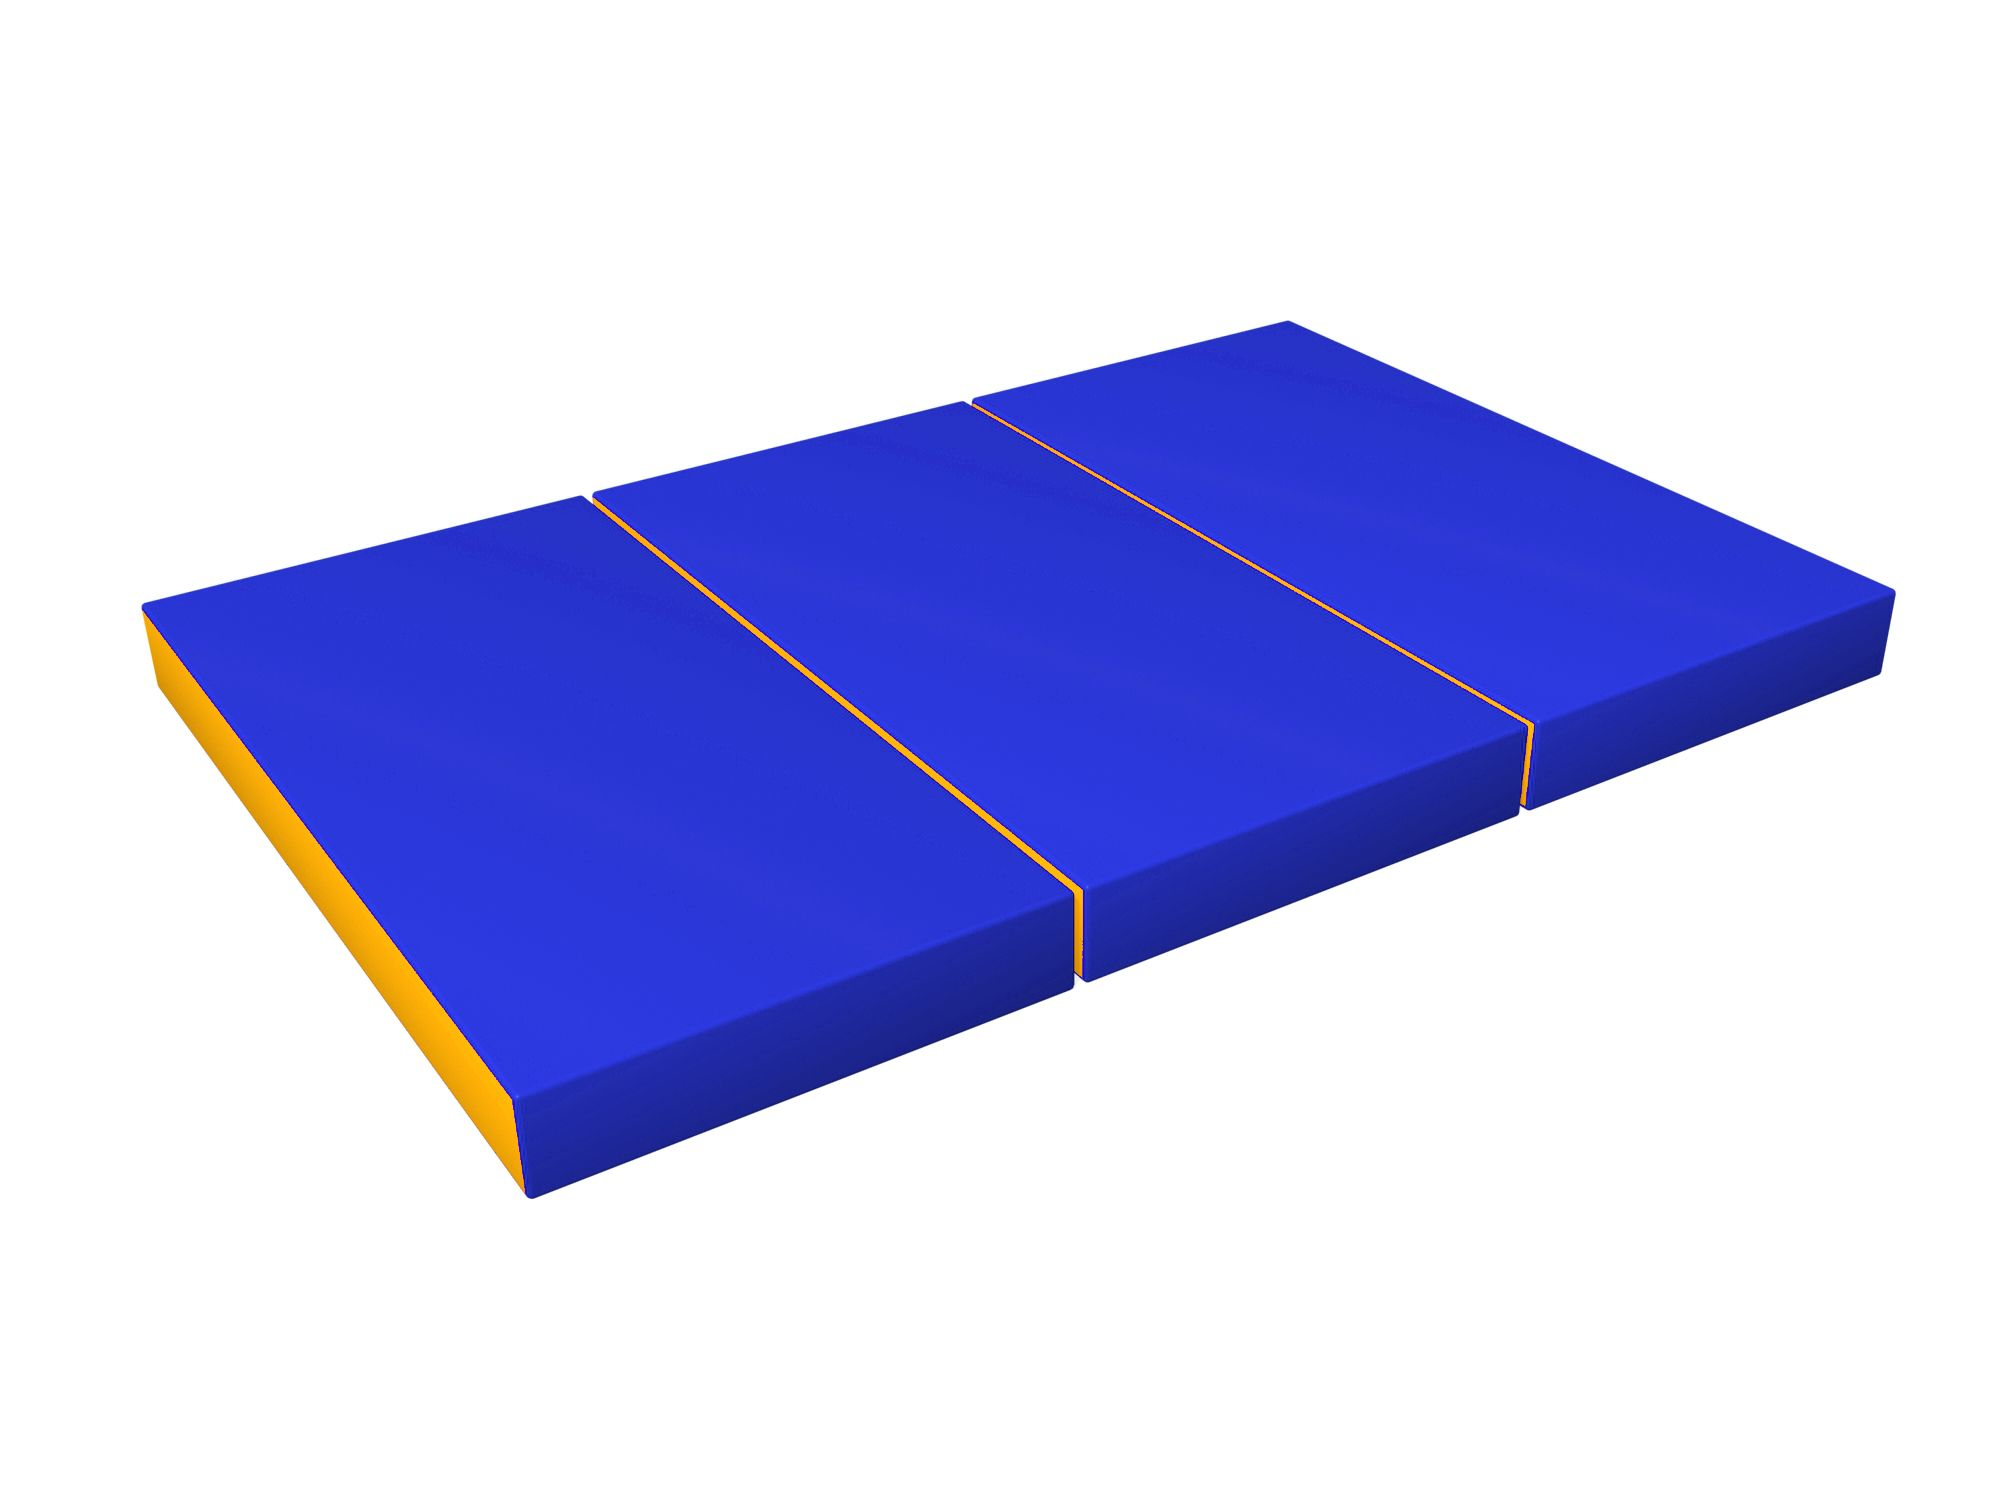 floor homcom gymnastics fitness clearance sports gym cm leisure pilates yoga thick foam black exercise mats folding mat pink diy